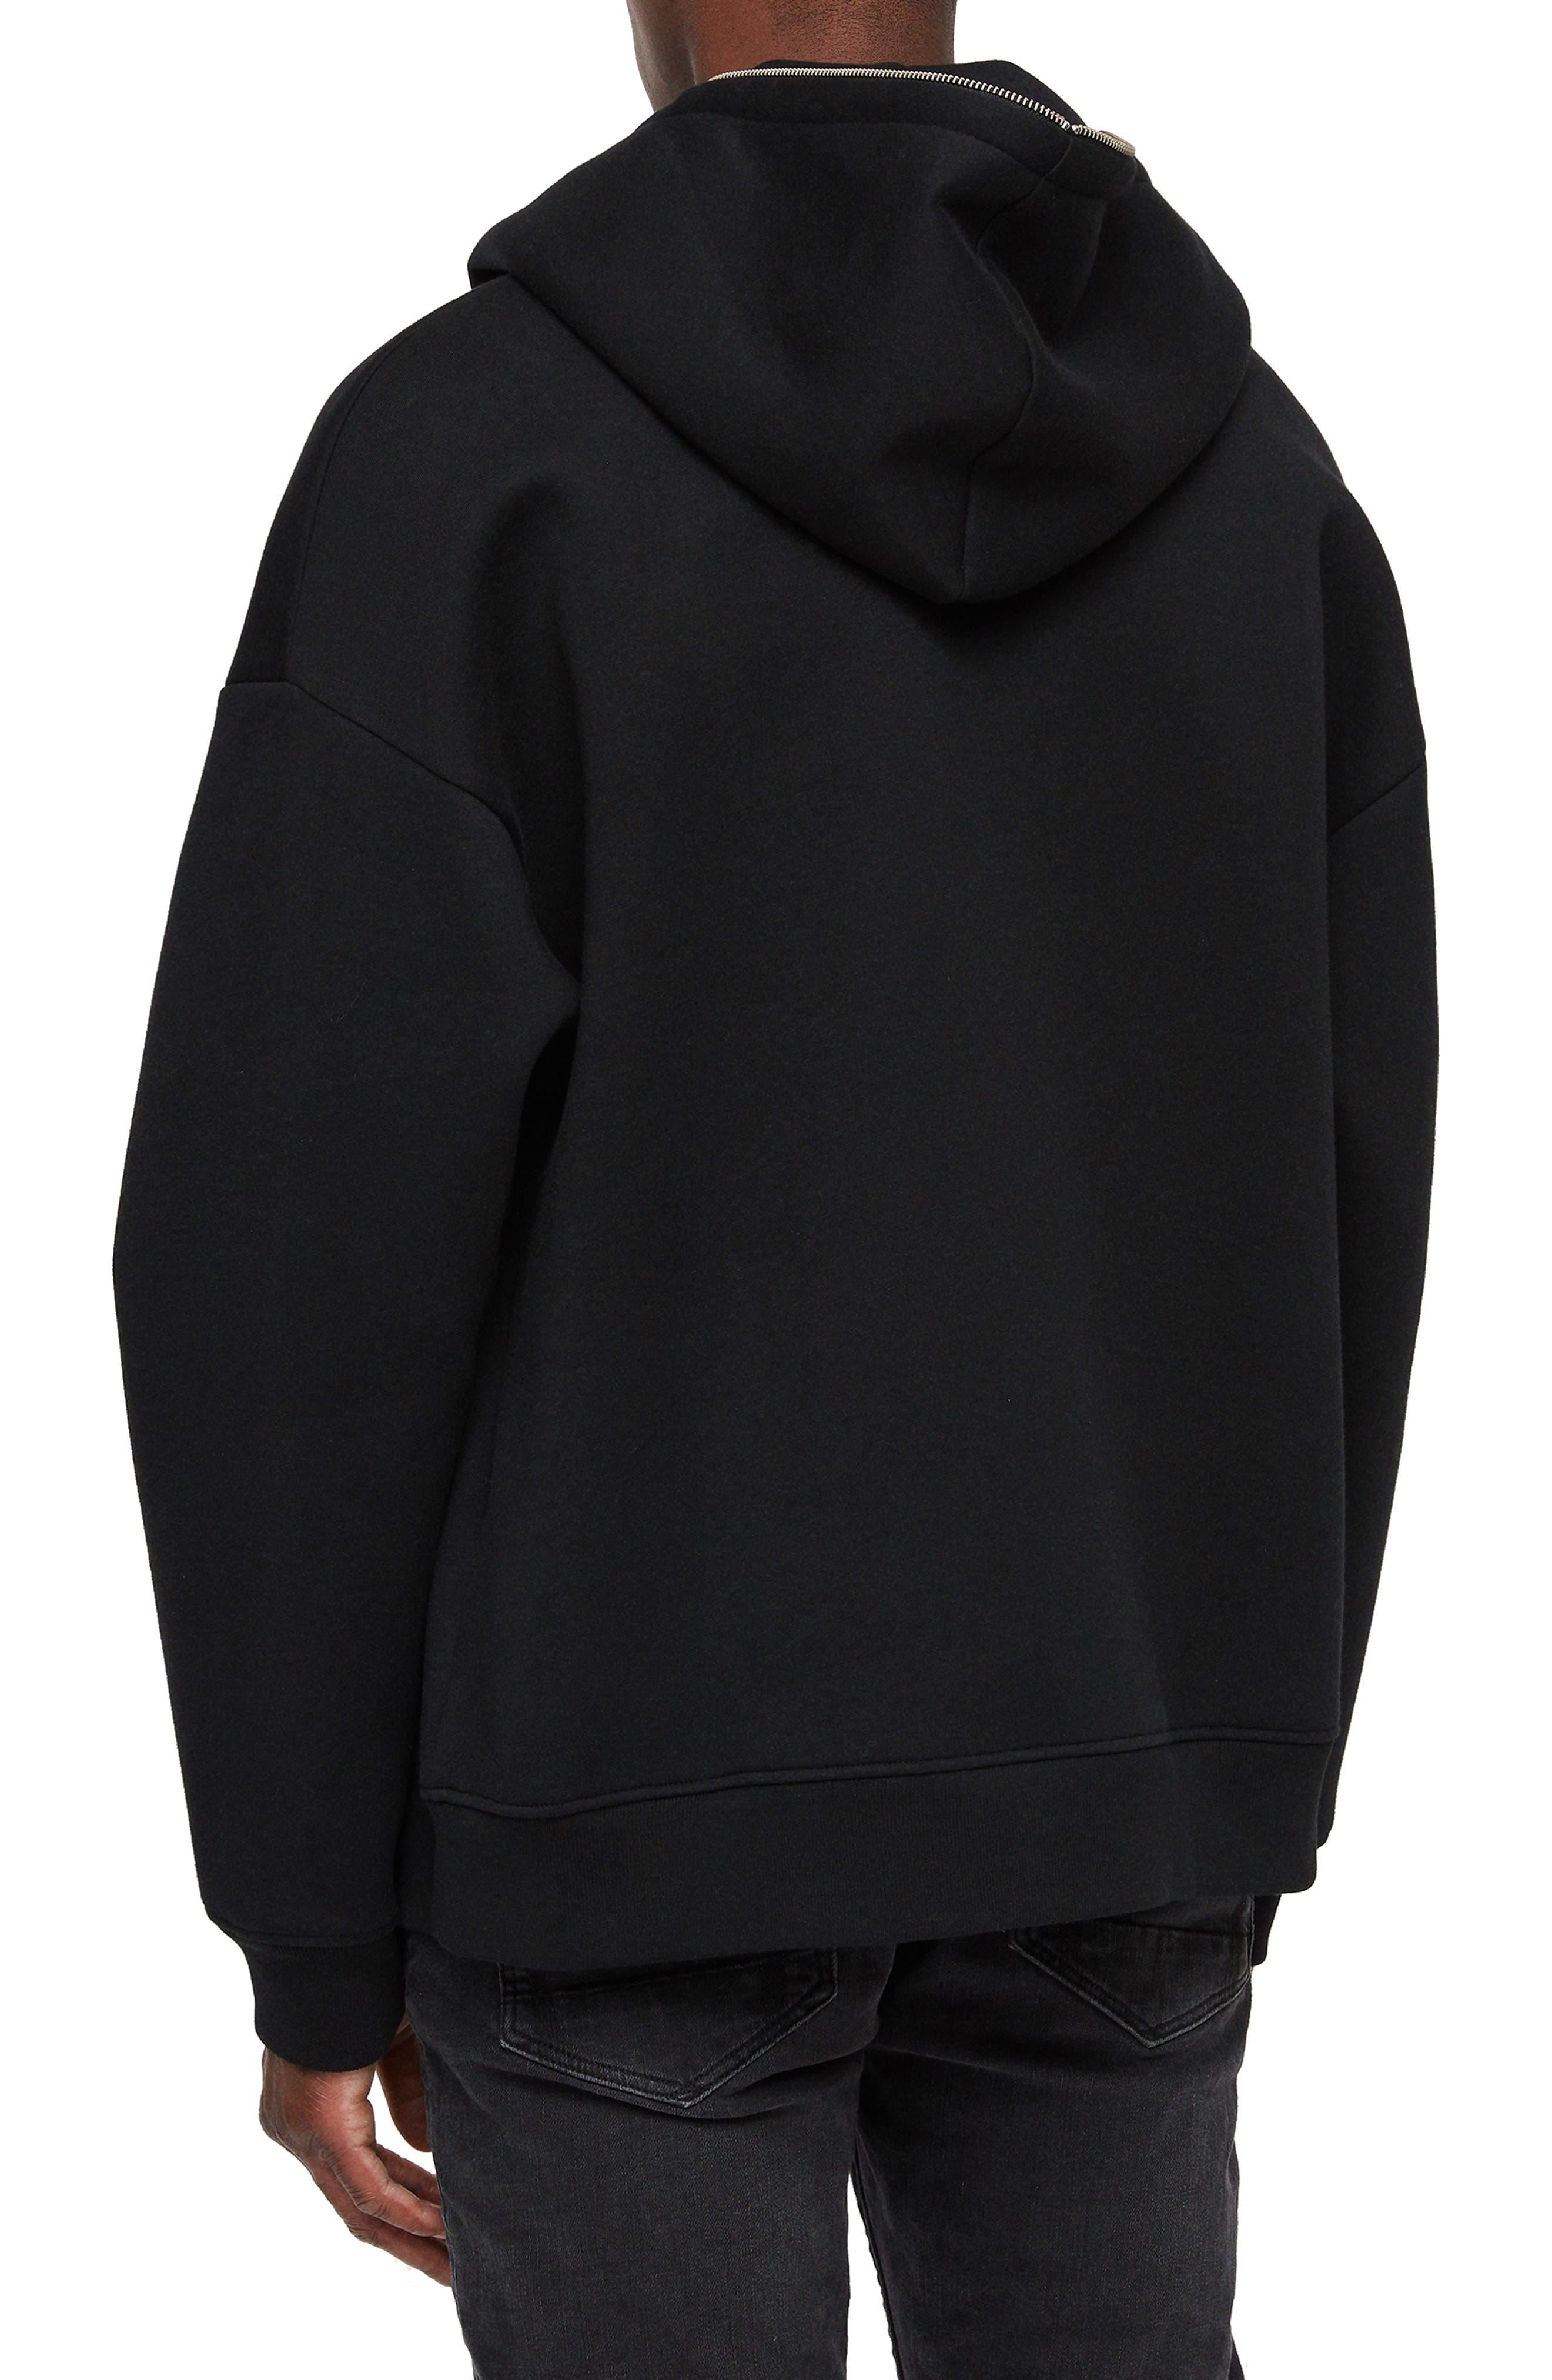 Hibard Regular Fit Zip Hoodie,                             Alternate thumbnail 2, color,                             JET BLACK